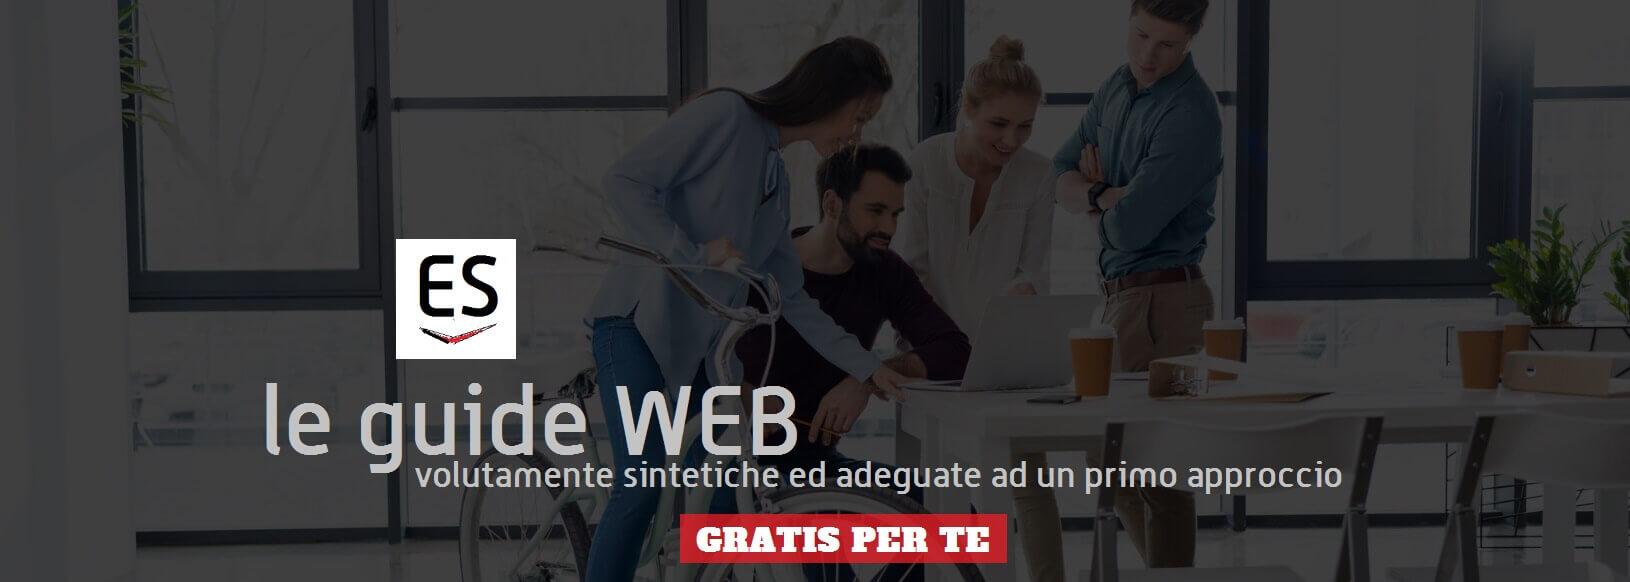 guide strategie web gratuite